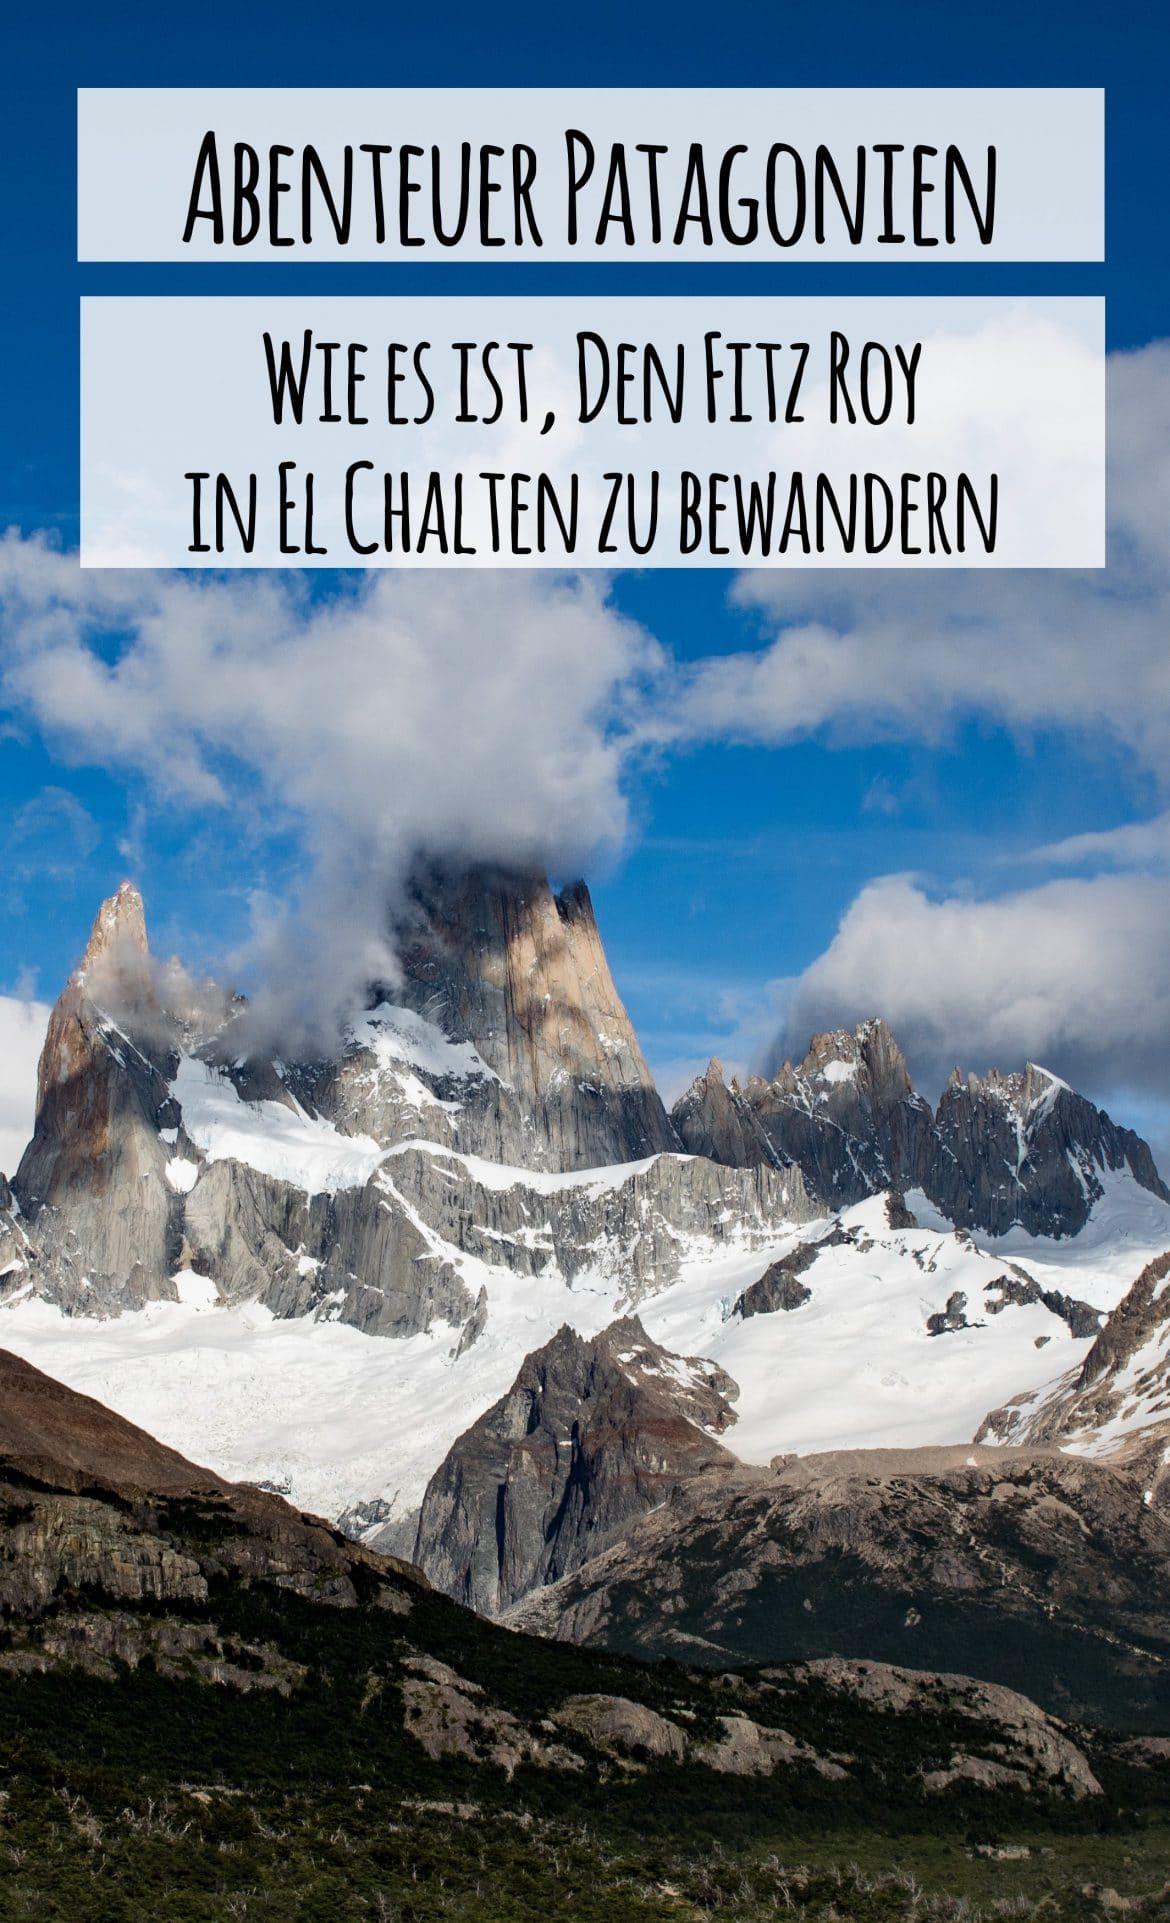 Patagonien Abenteuer - Fitz Roy Wanderung in El Chalten